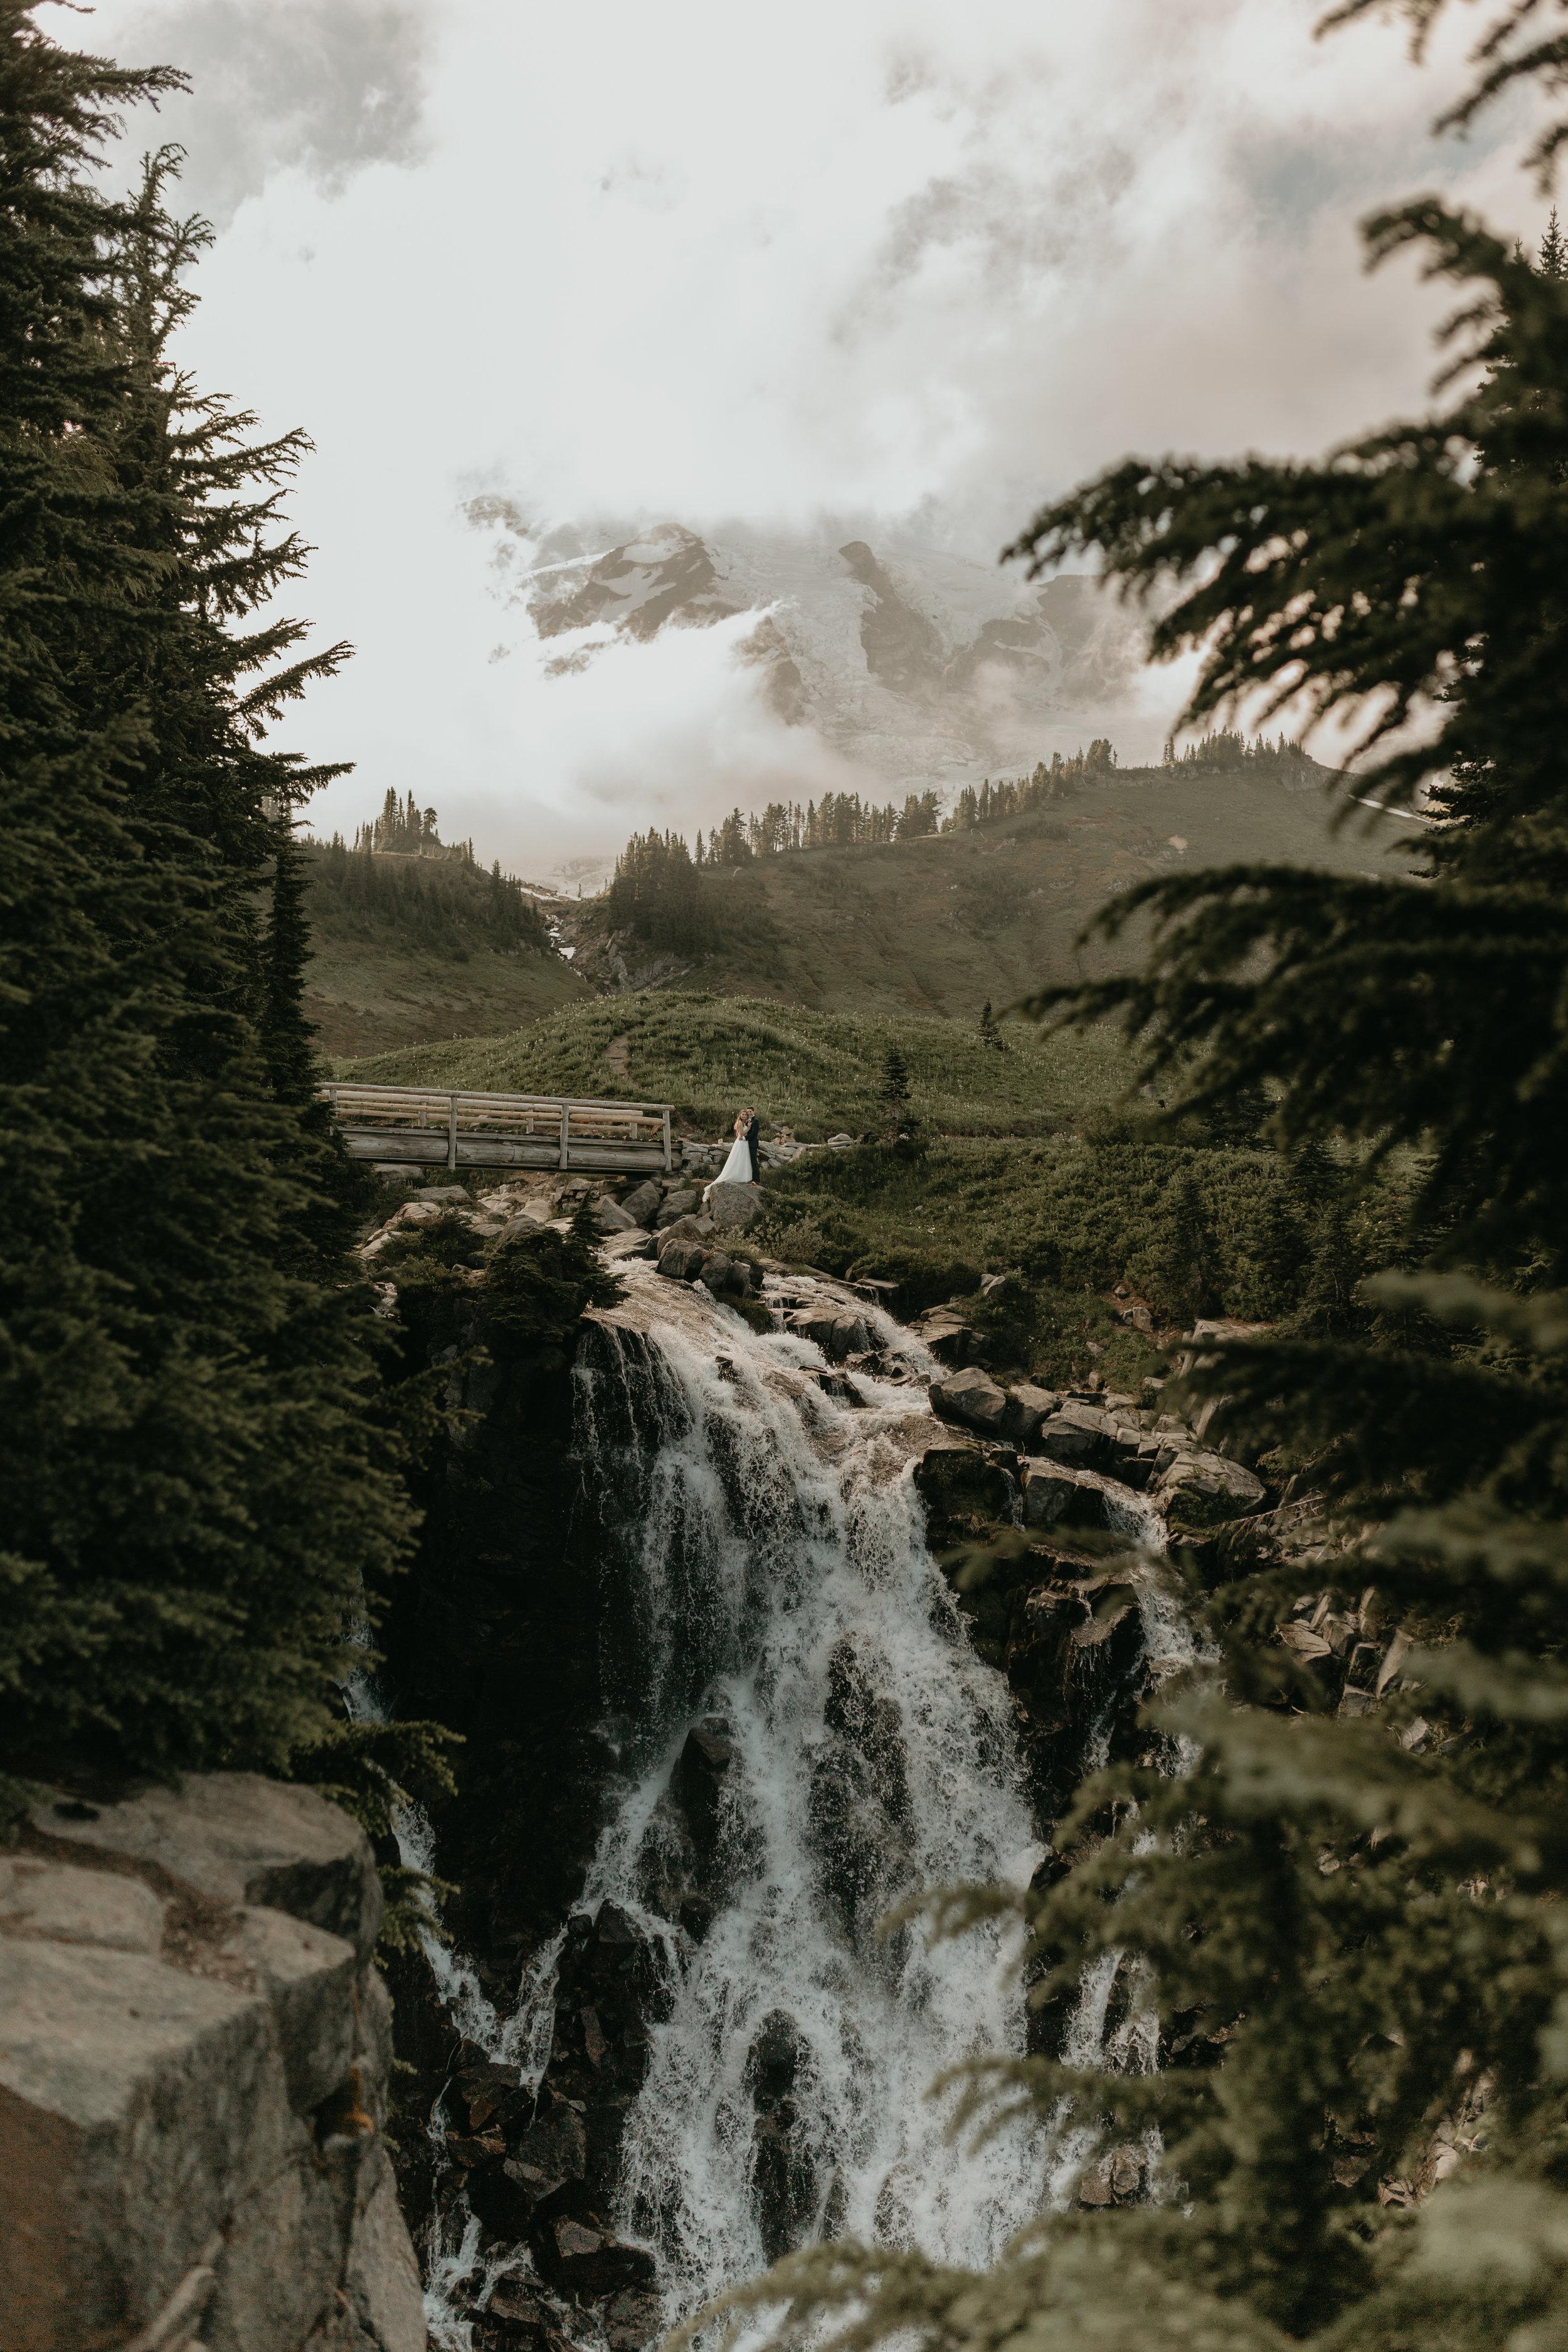 Nicole-Daacke-Photography-Mt-Rainier-elopement-photographer-washington-mountain-epic-wedding-photography-wildflowers-at-rainier-pine-tree-cloudy-summer-day-at-mountain-rainier-20.jpg